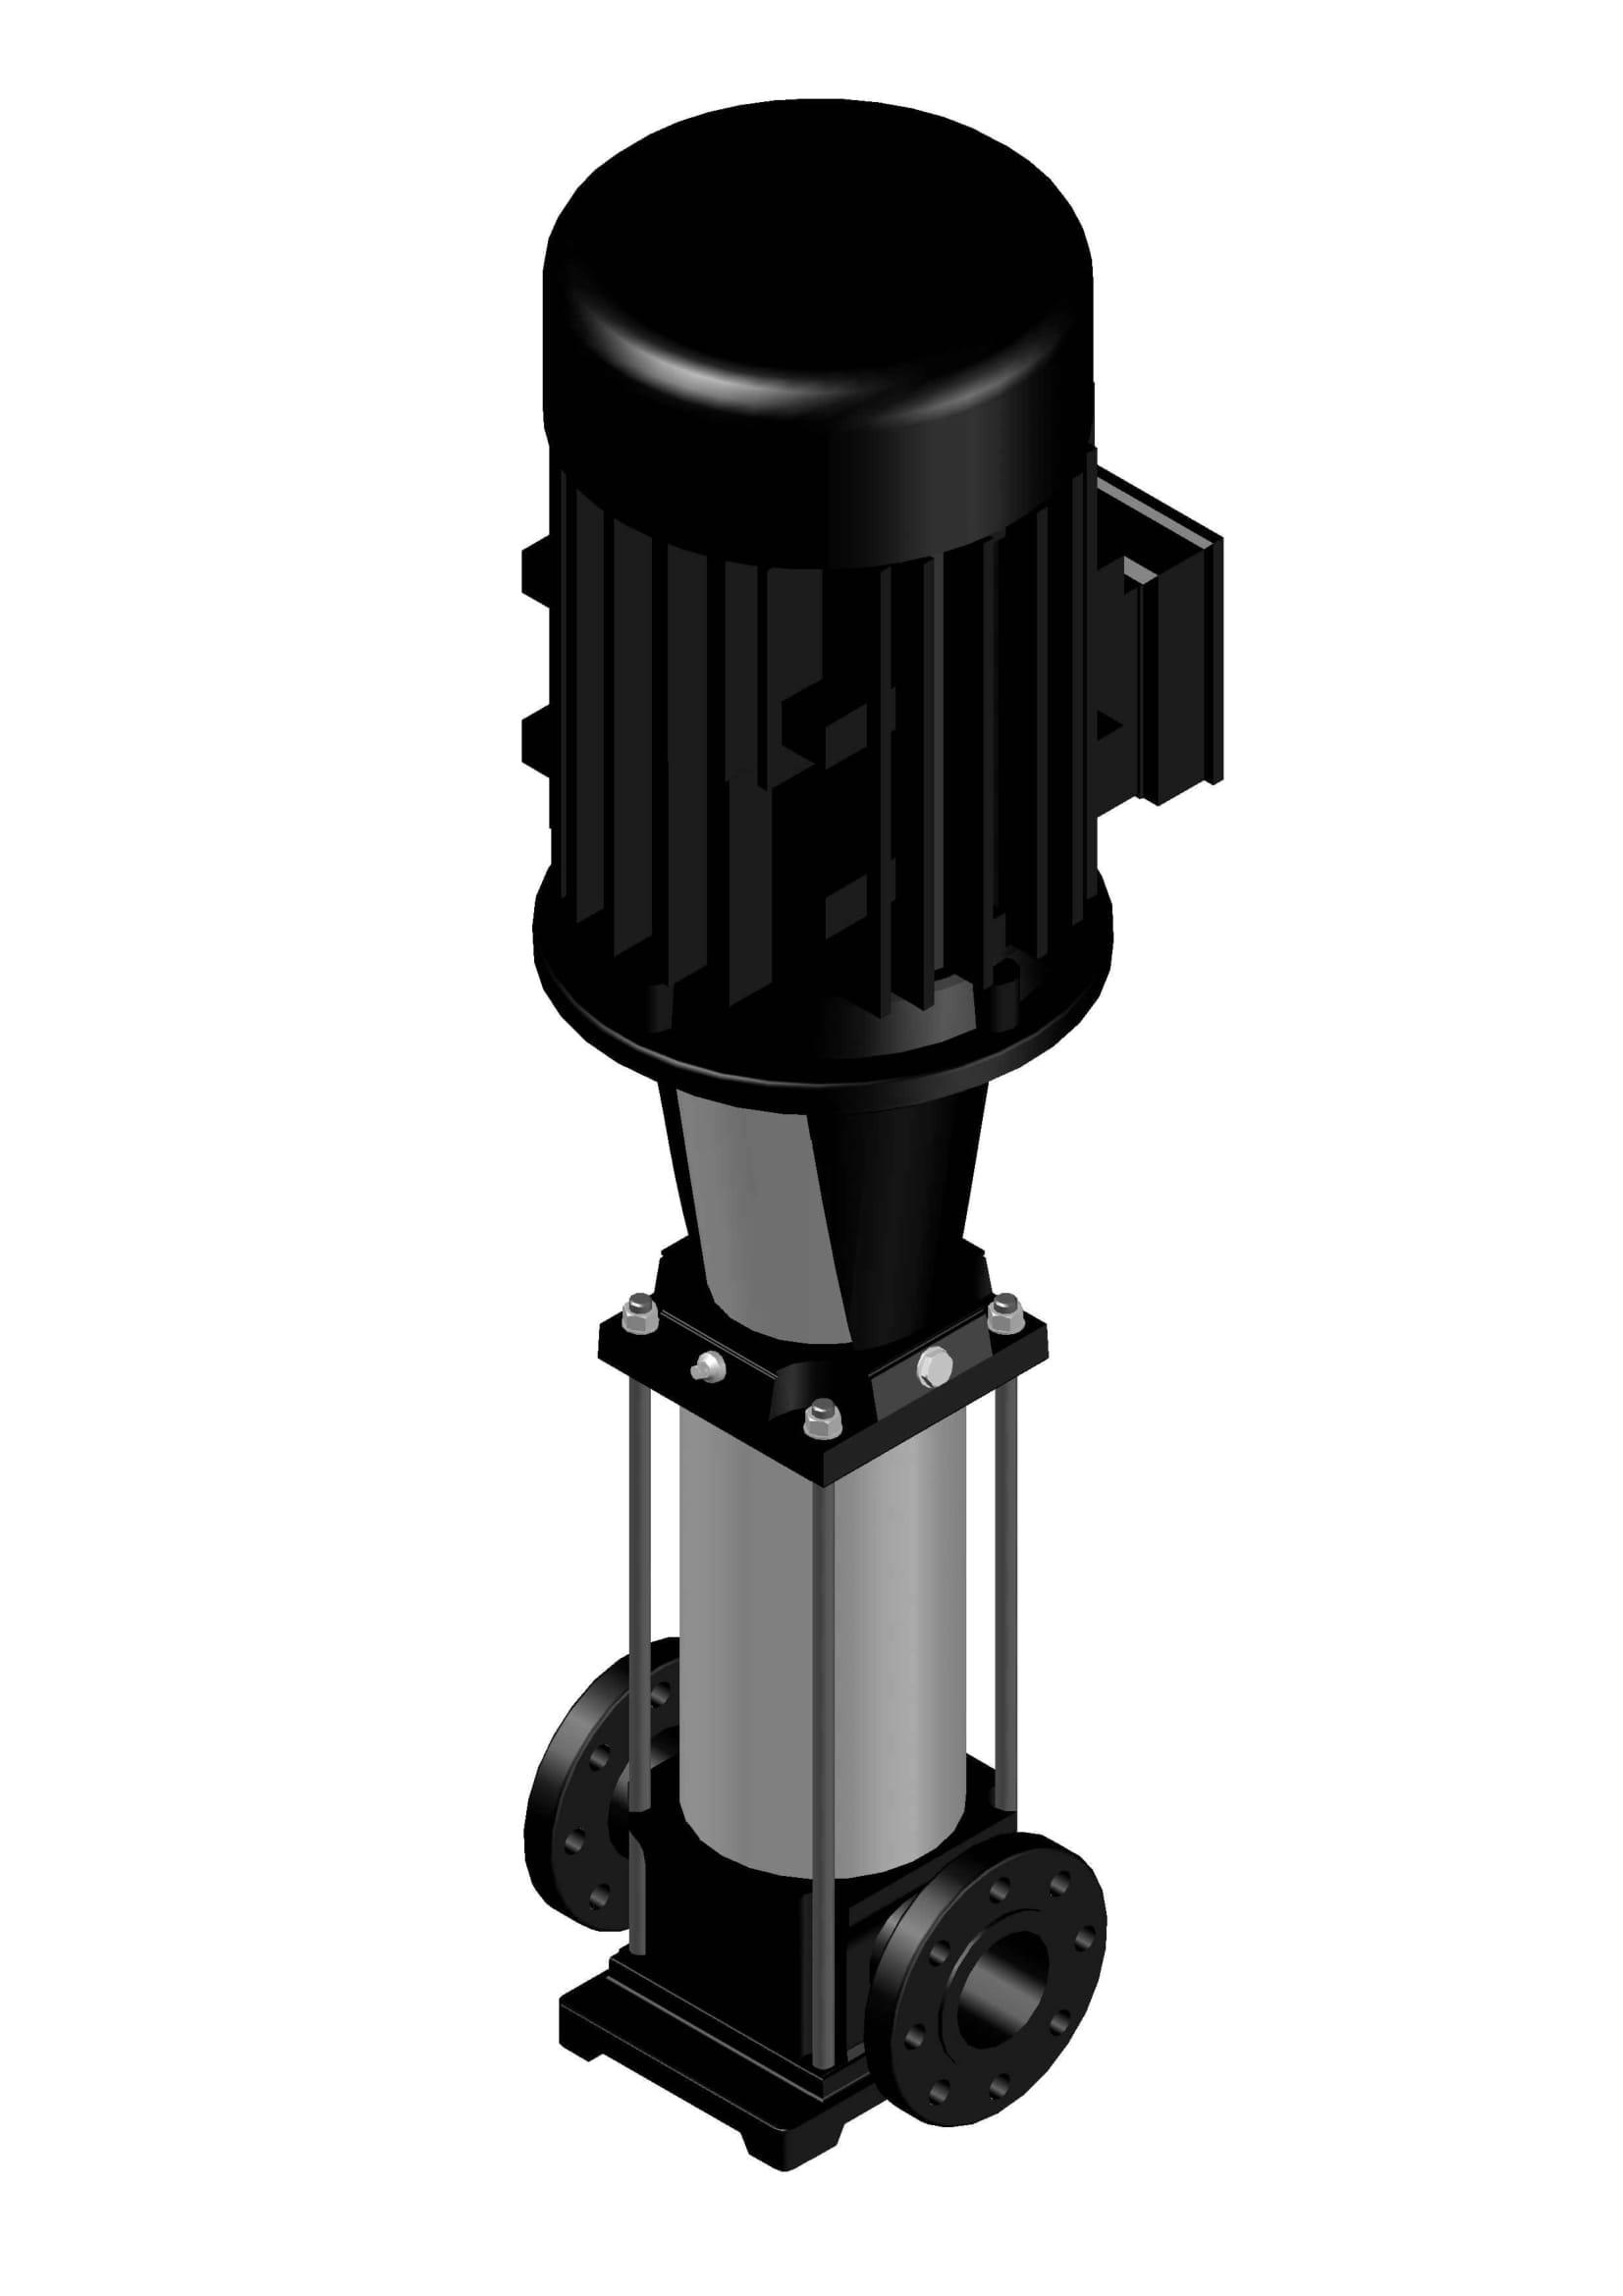 BV 64-05-02